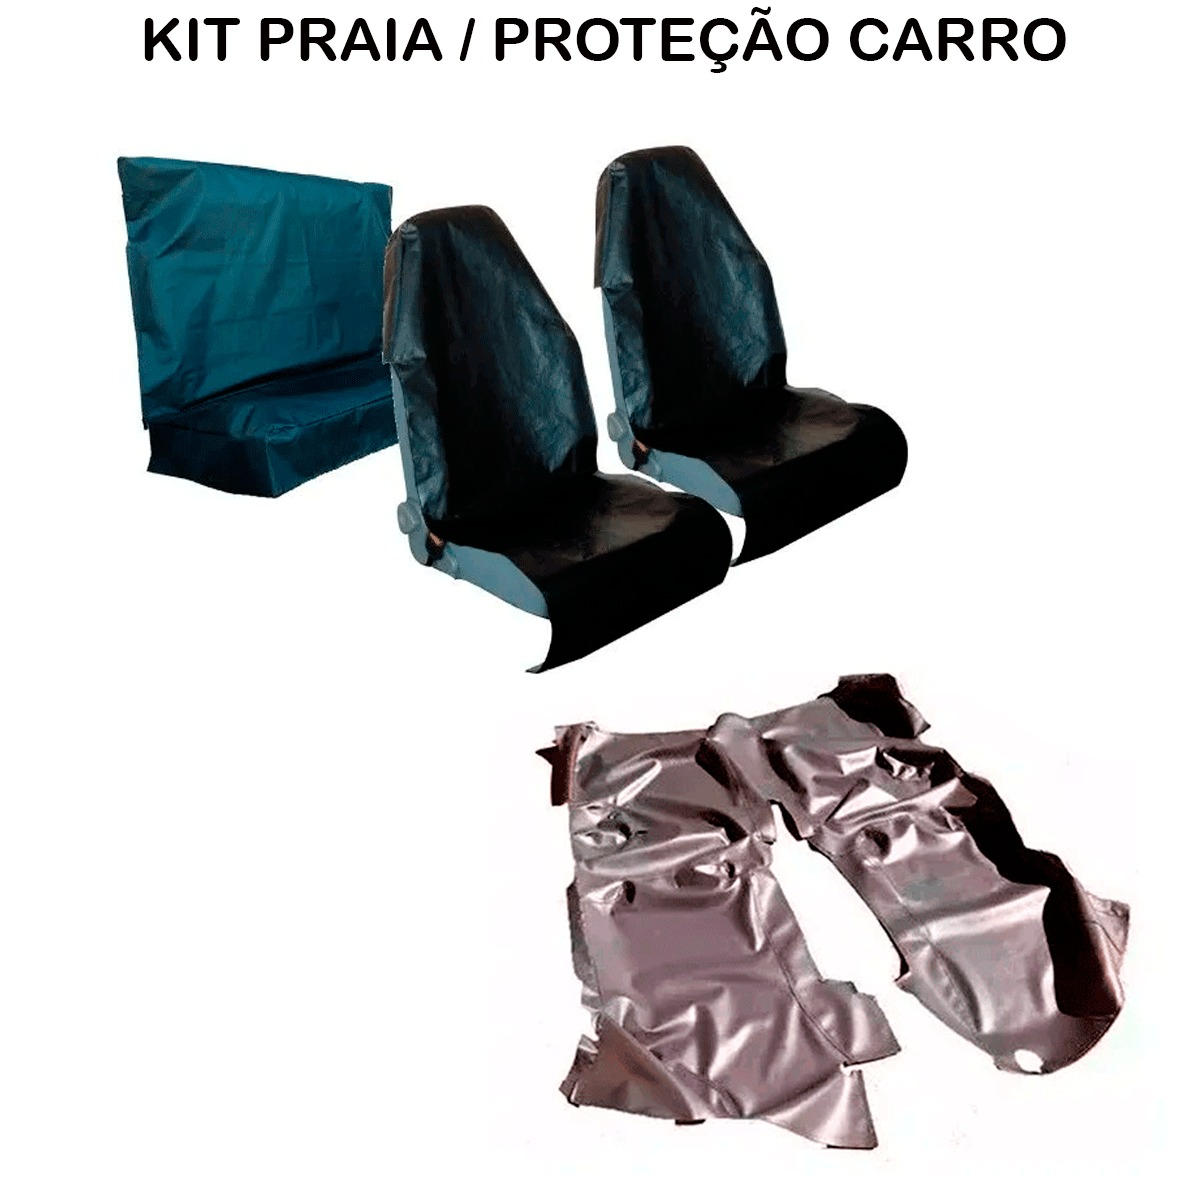 Tapete Em Vinil Renault Clio 2003 a 2012 + Capa Banco Protecao Banco Areia Suor Academia